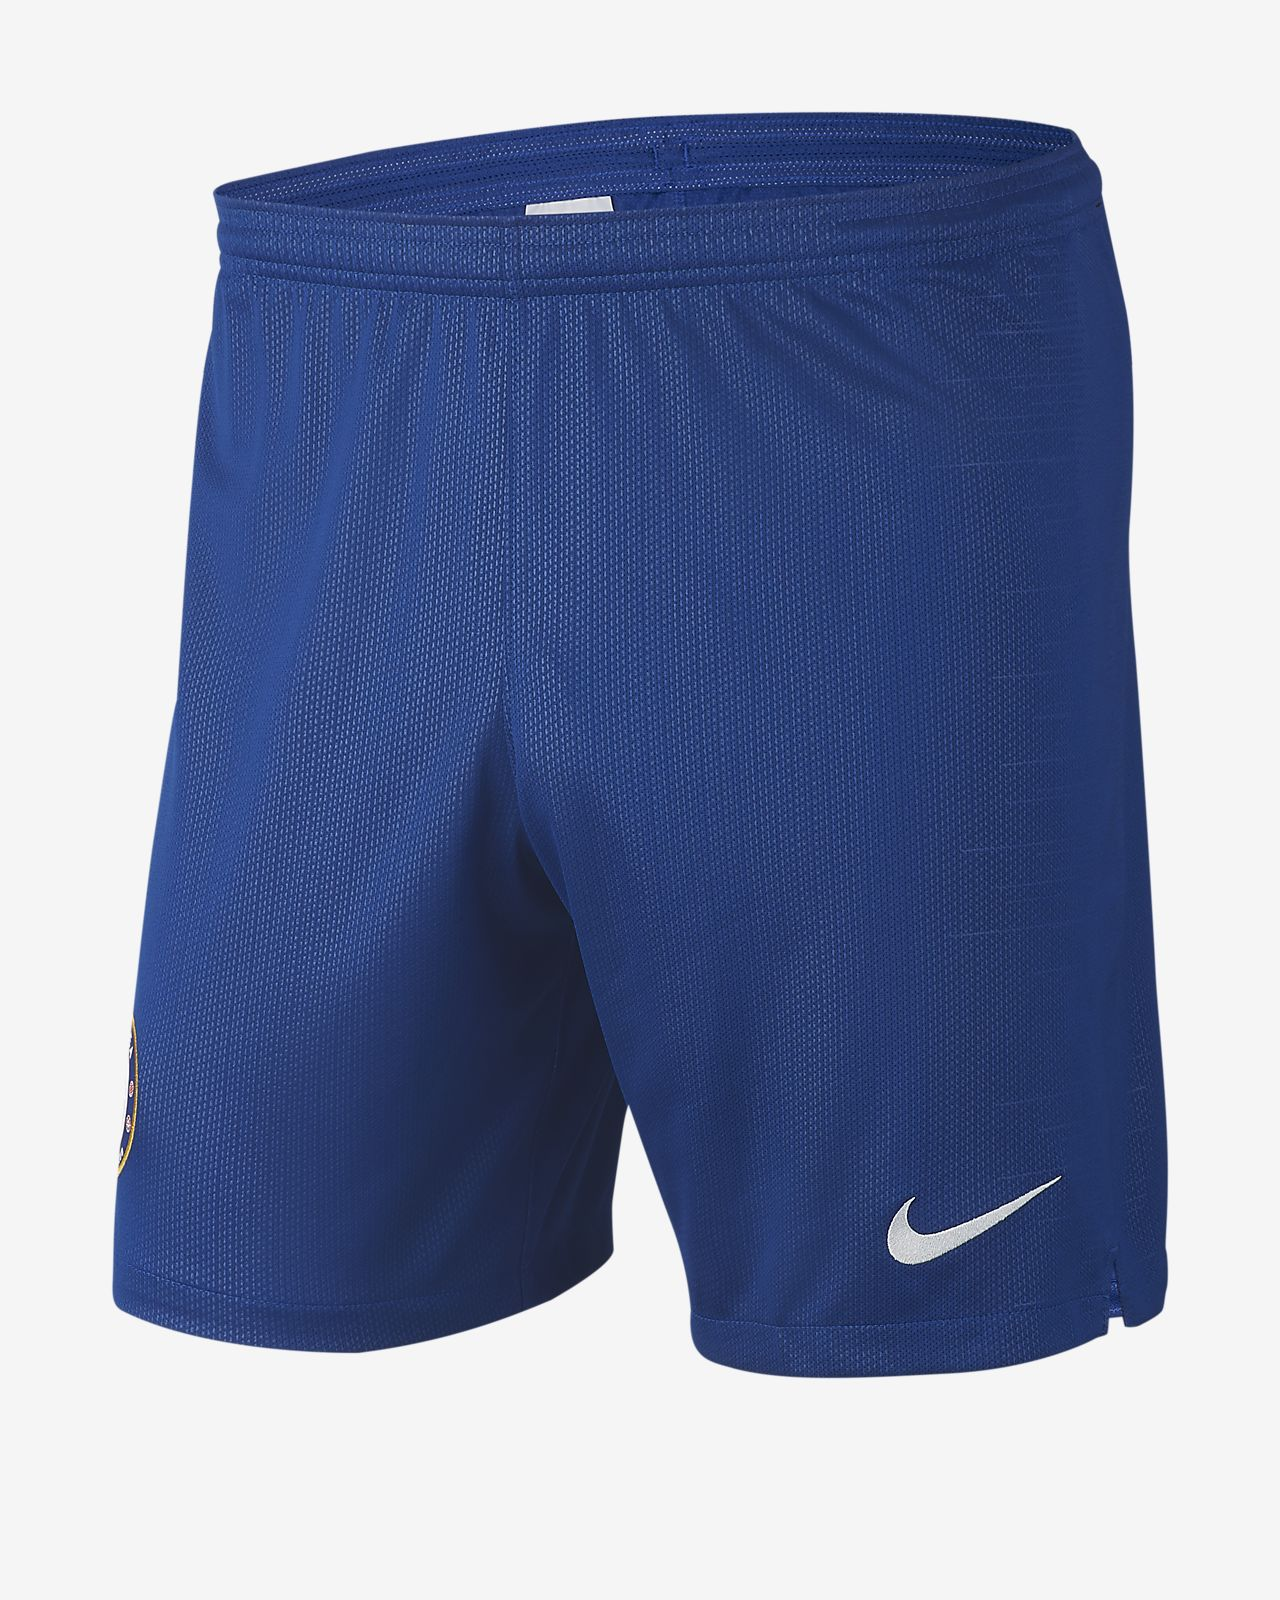 2018/19 Chelsea FC Stadium Home/Away Pantalons curts de futbol - Home